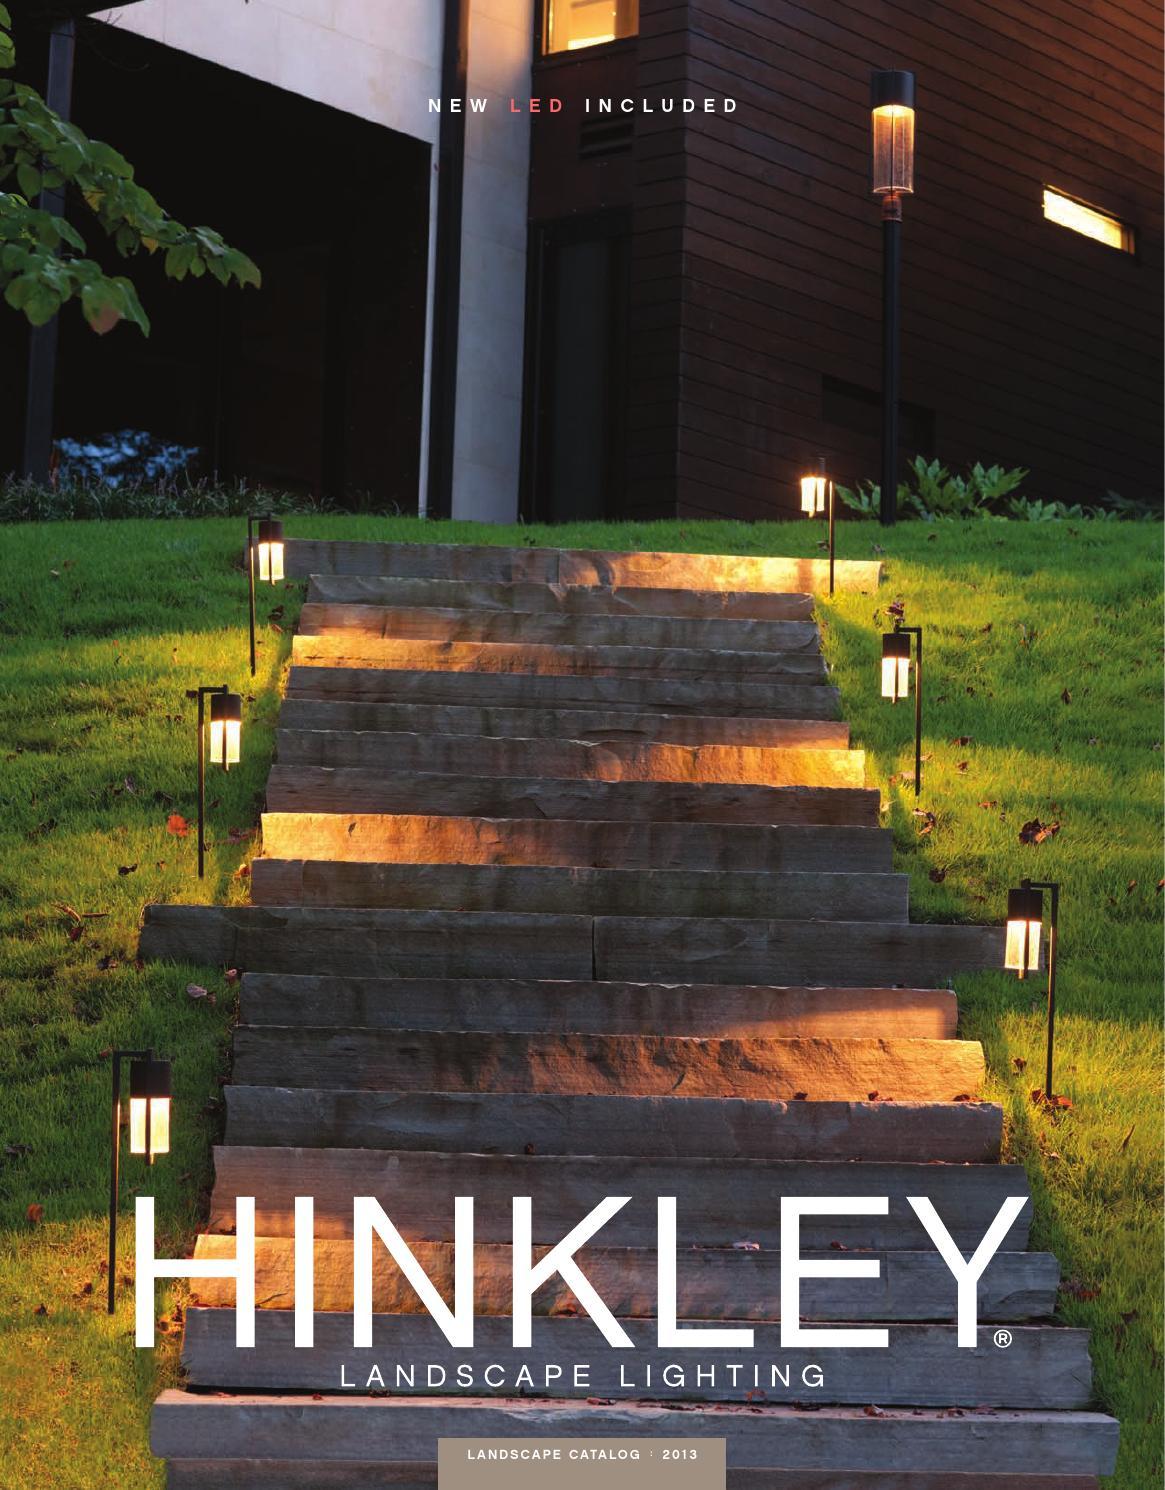 hinkley landscape lighting 2013 by